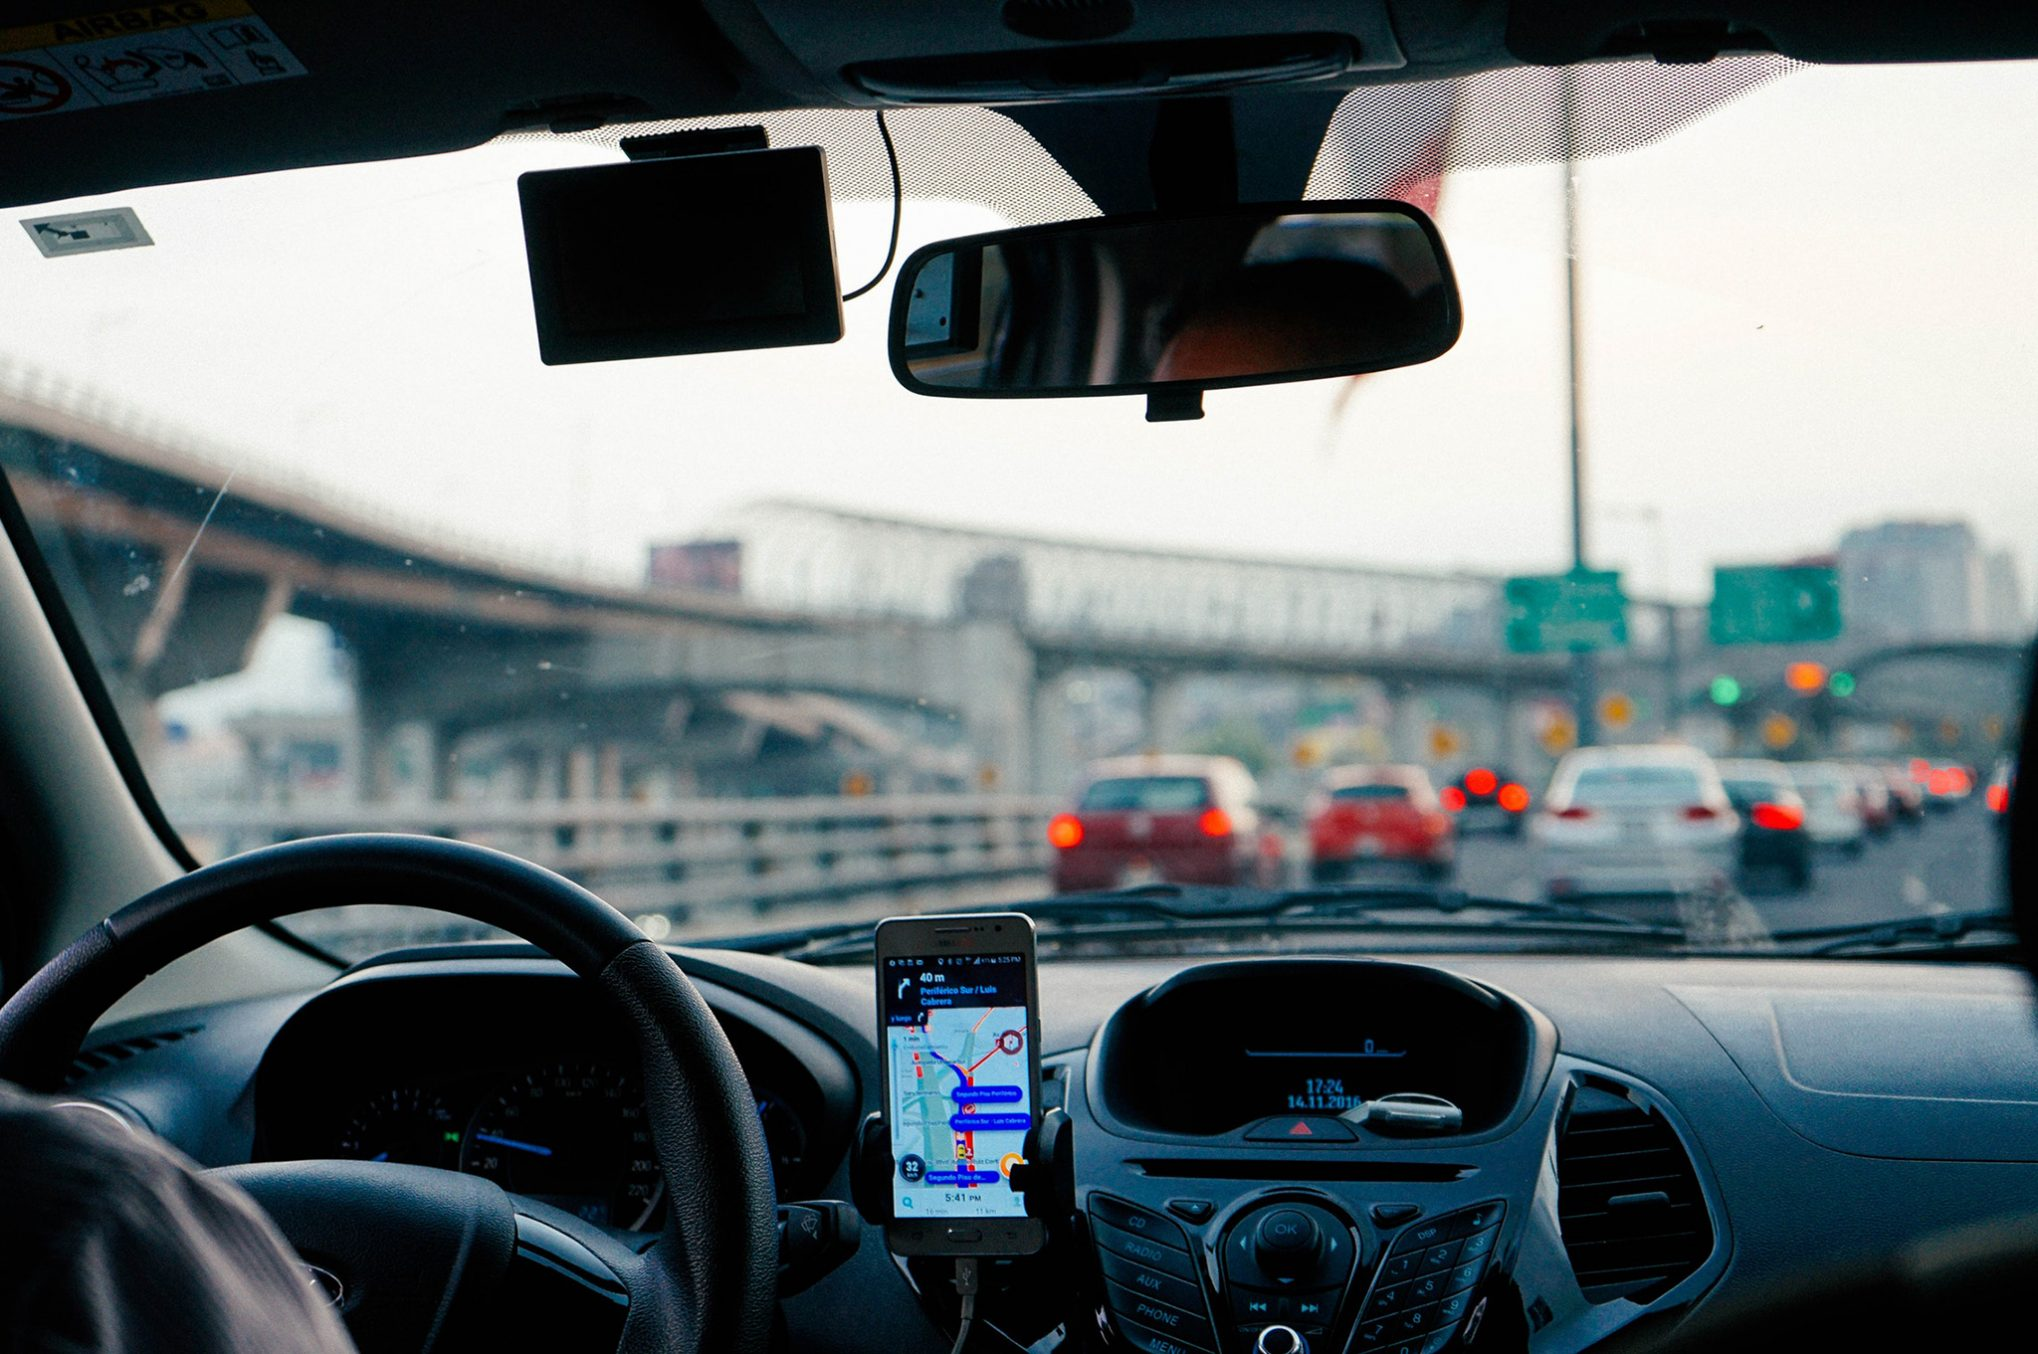 uber-a-kolumbia-ako-ho-vyuzivat-a-nenechat-sa-chytit